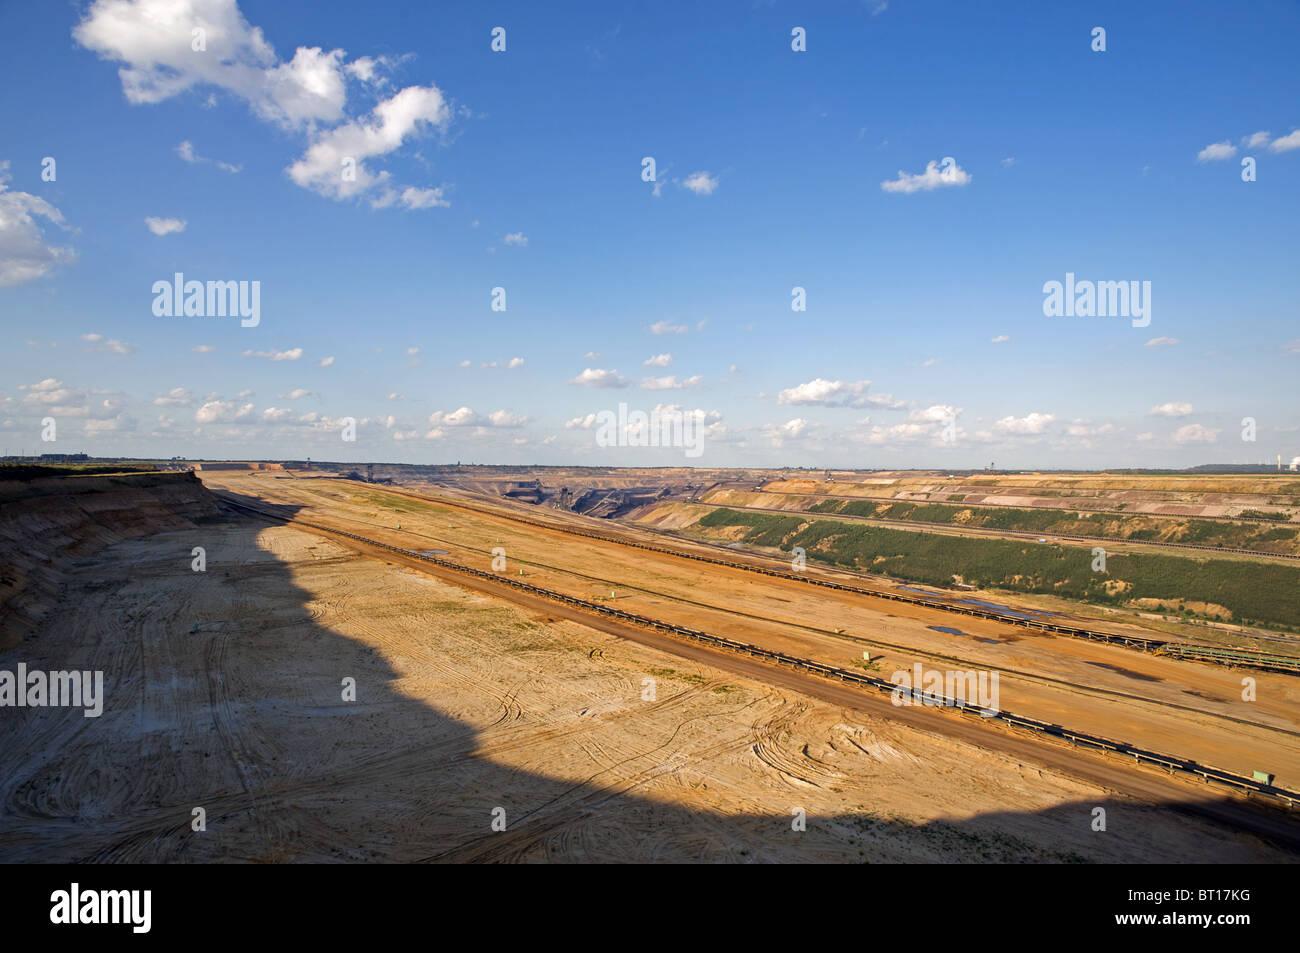 Mina de carbón a cielo abierto, Alemania. Imagen De Stock